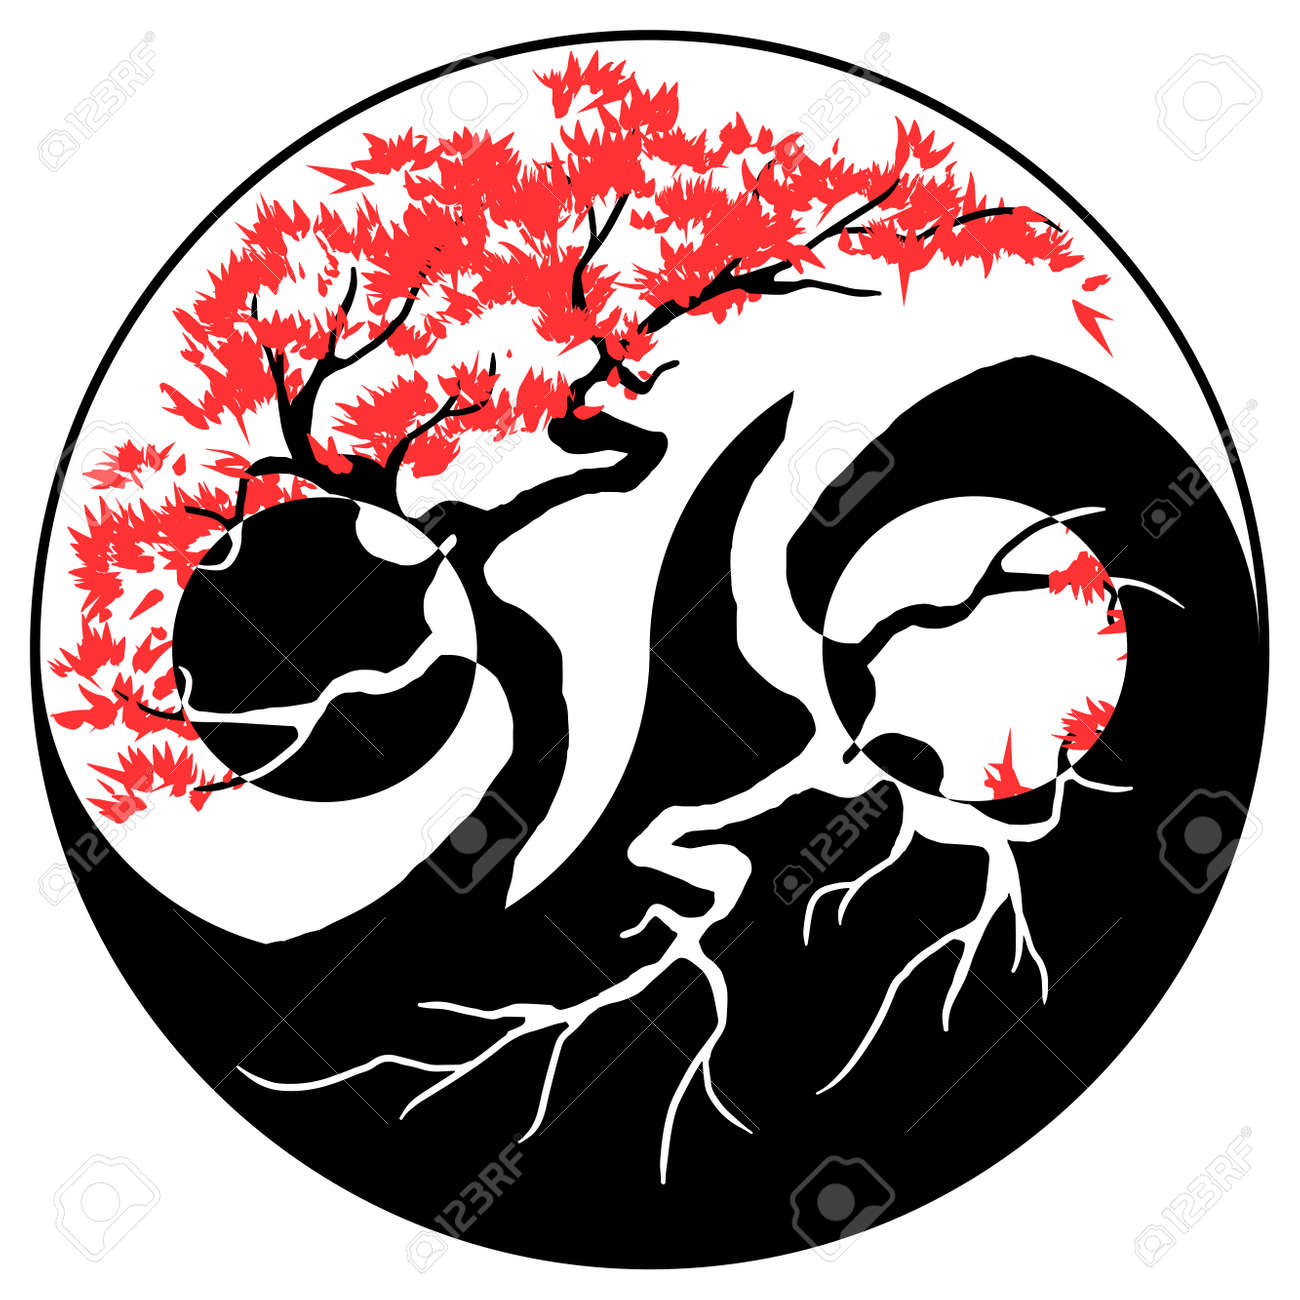 Black and white bonsai tree in the yin yang symbol royalty free black and white bonsai tree in the yin yang symbol stock vector 72407341 buycottarizona Choice Image